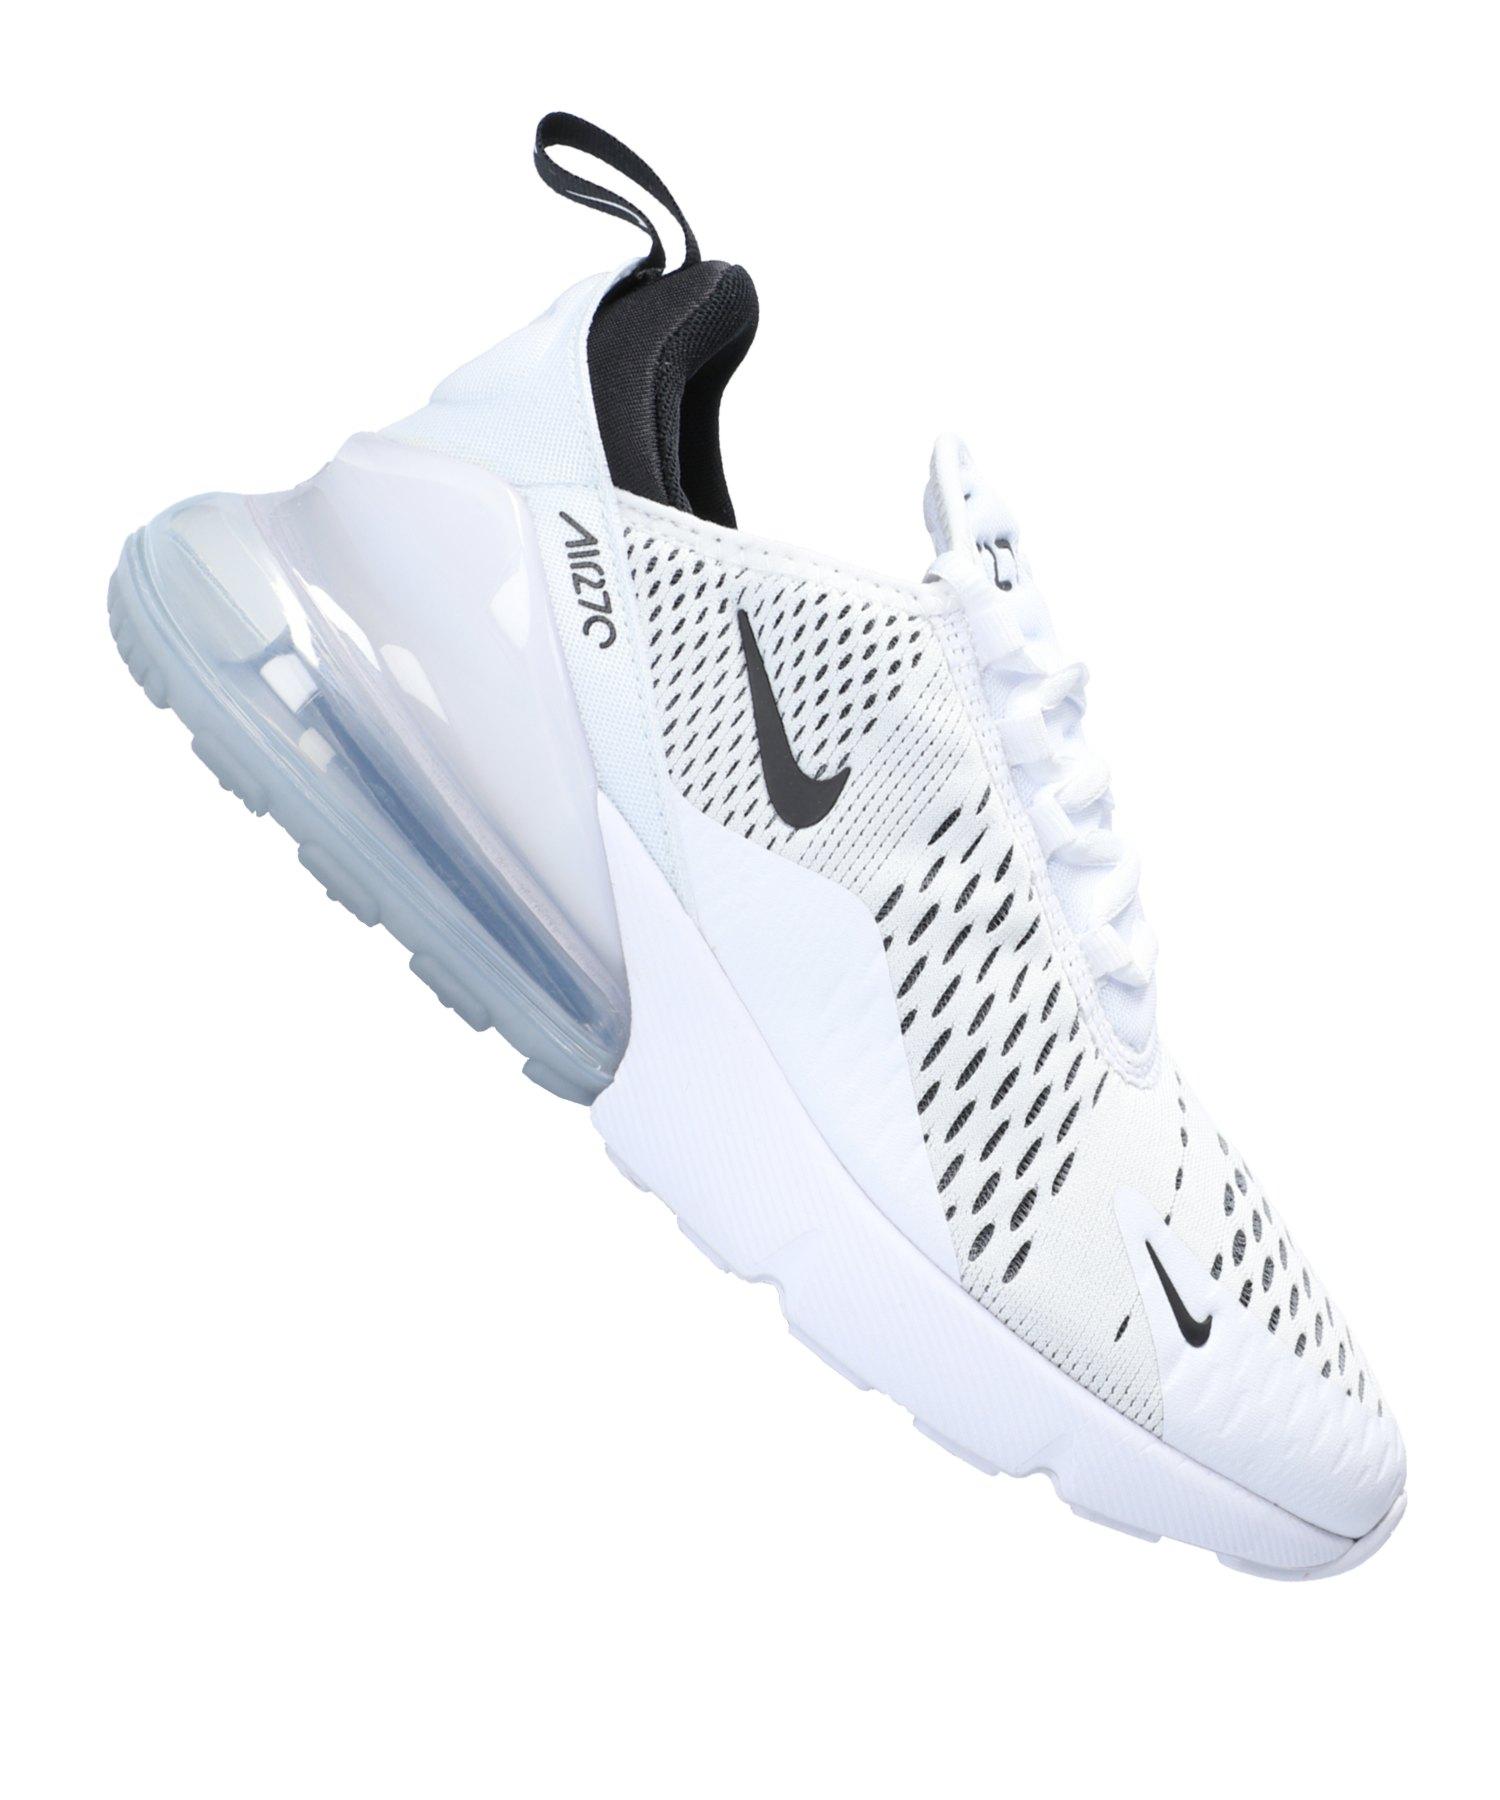 Super Specials Nike Sportswear Air Max Tavas Essential